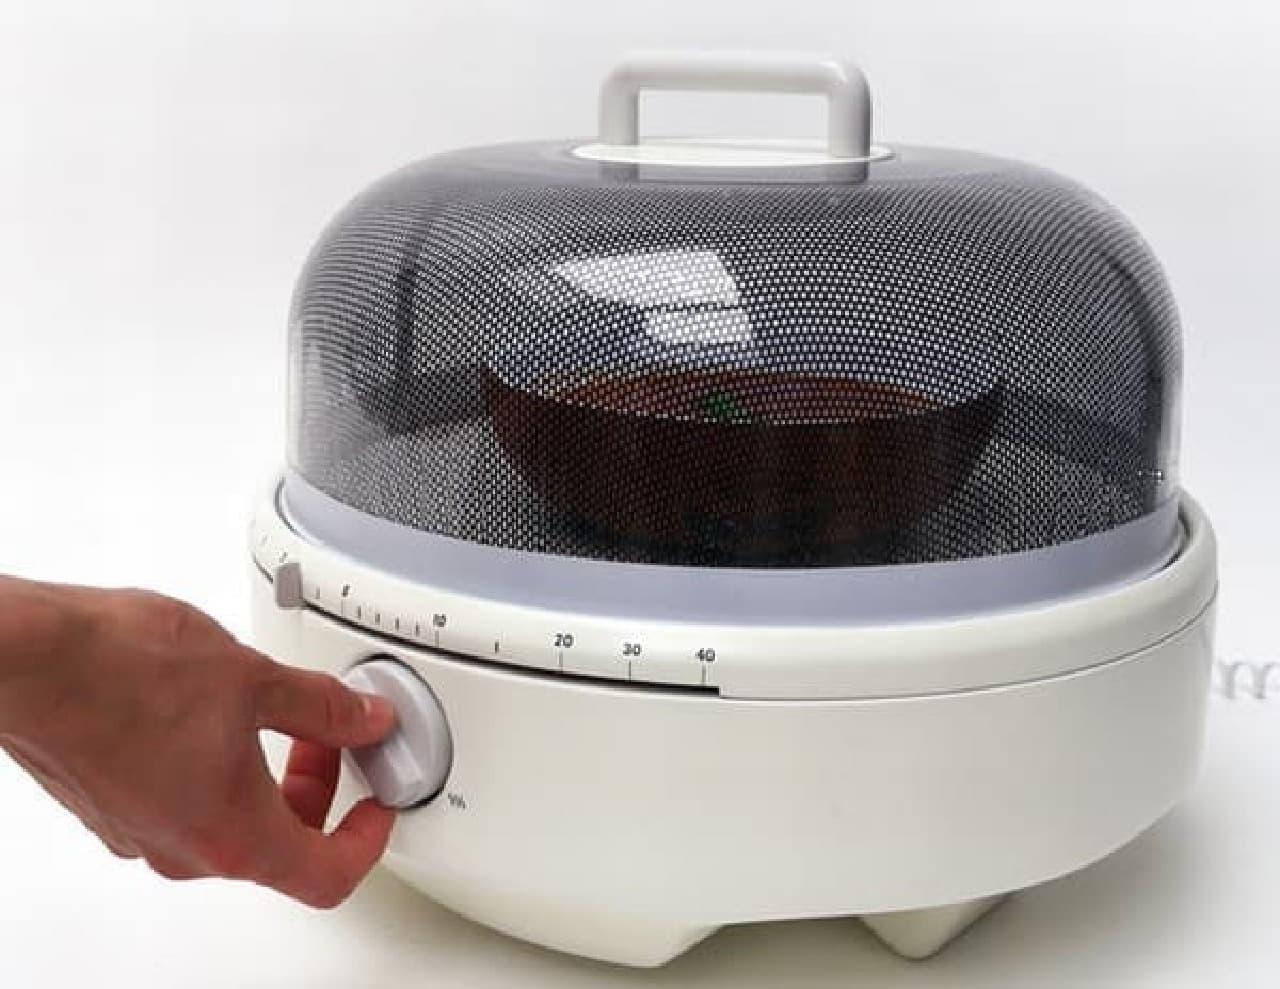 「Mediumwave」を使えば、テーブル上で手軽にスープを温められます